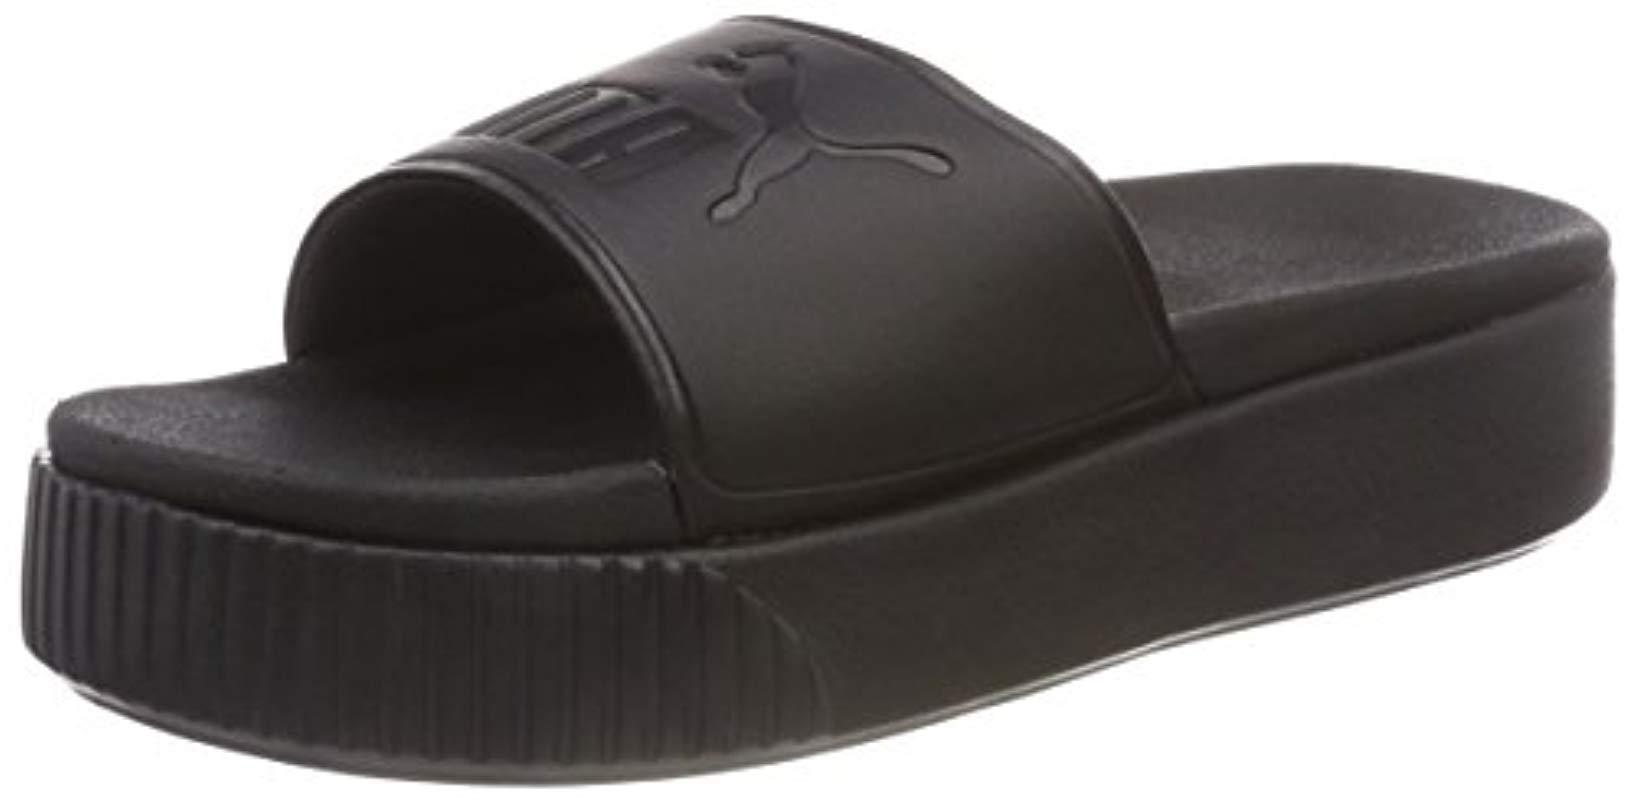 64be2635fcb PUMA Platform Slide Bold Wns Beach   Pool Shoes in Black - Save 56 ...